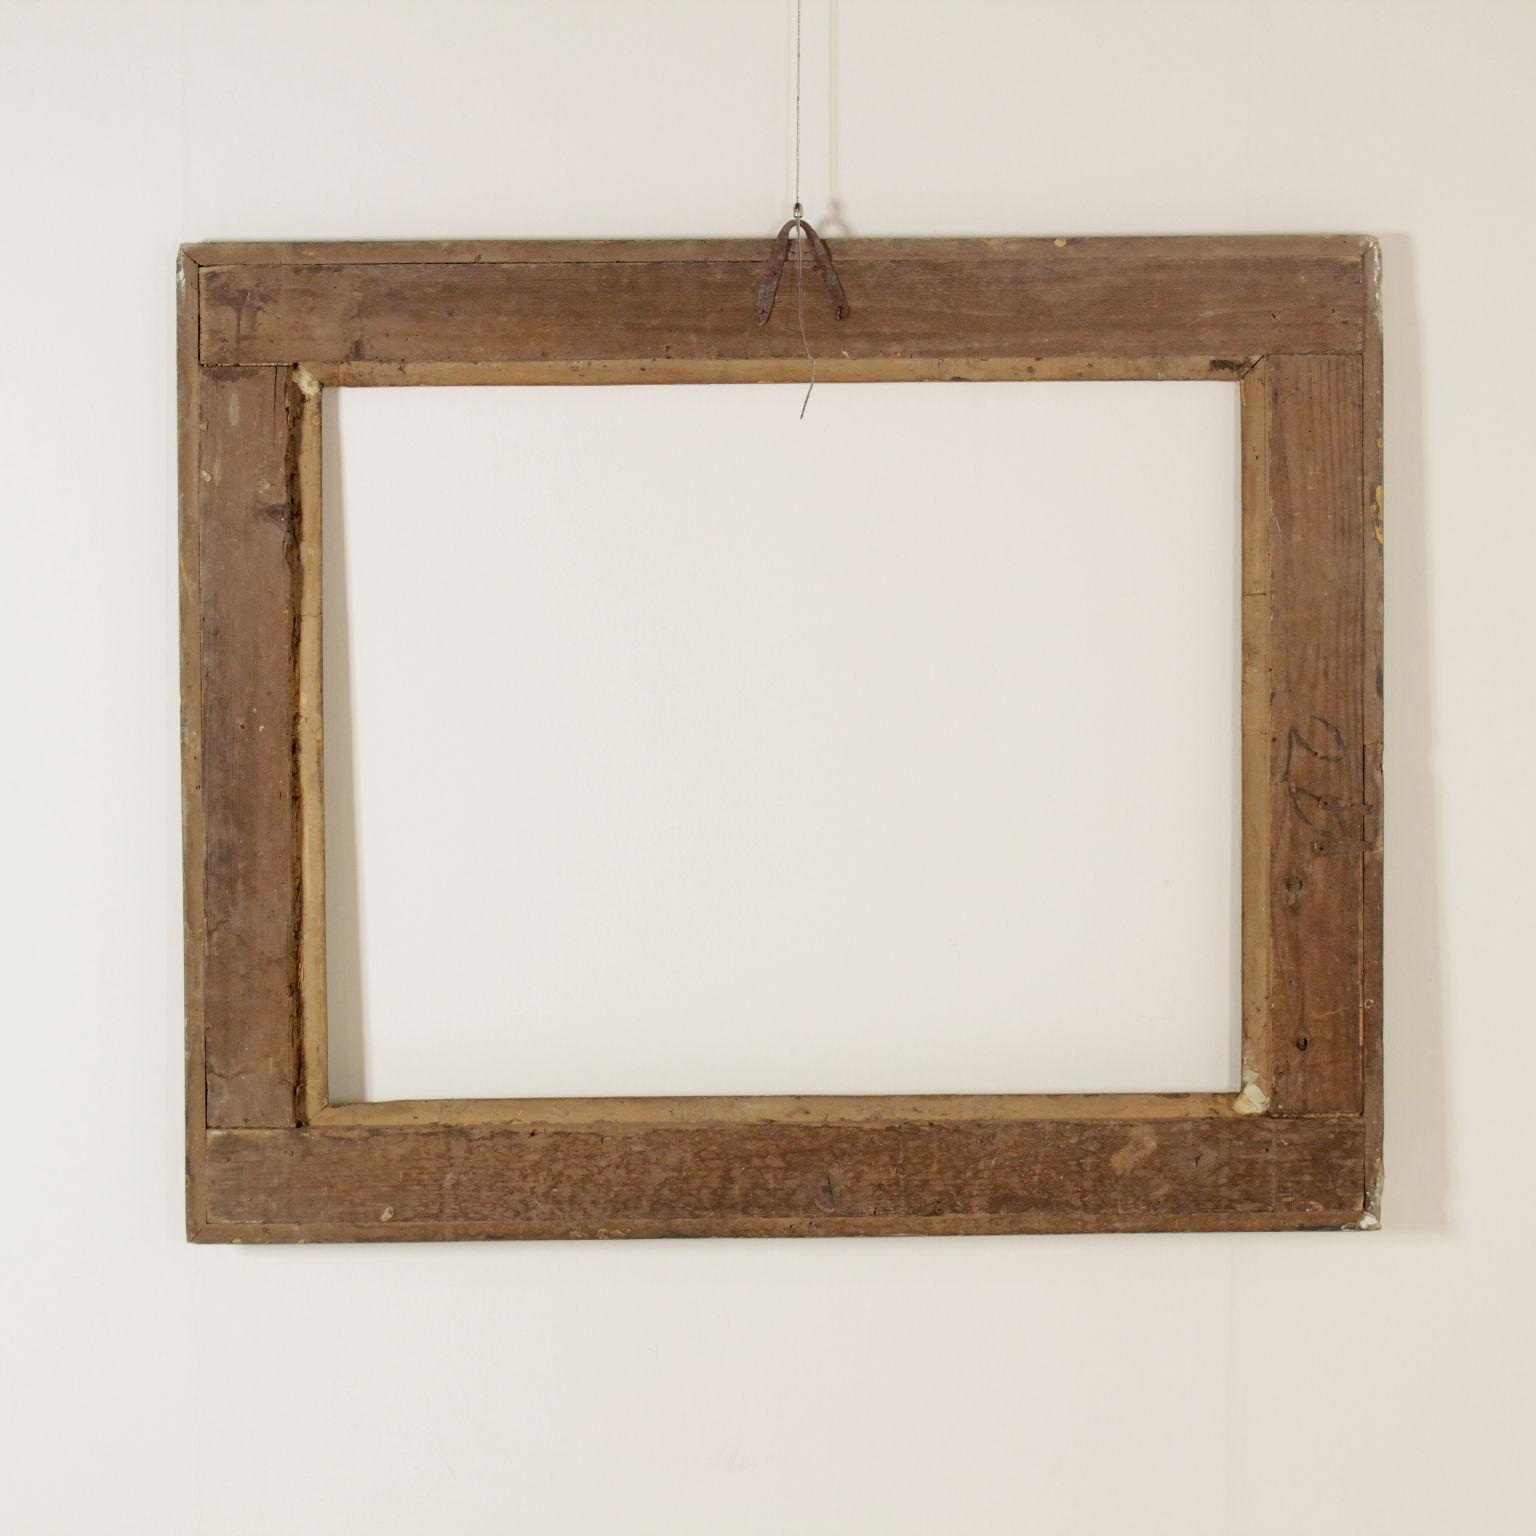 cadre antique miroirs et cadres antiquit s. Black Bedroom Furniture Sets. Home Design Ideas